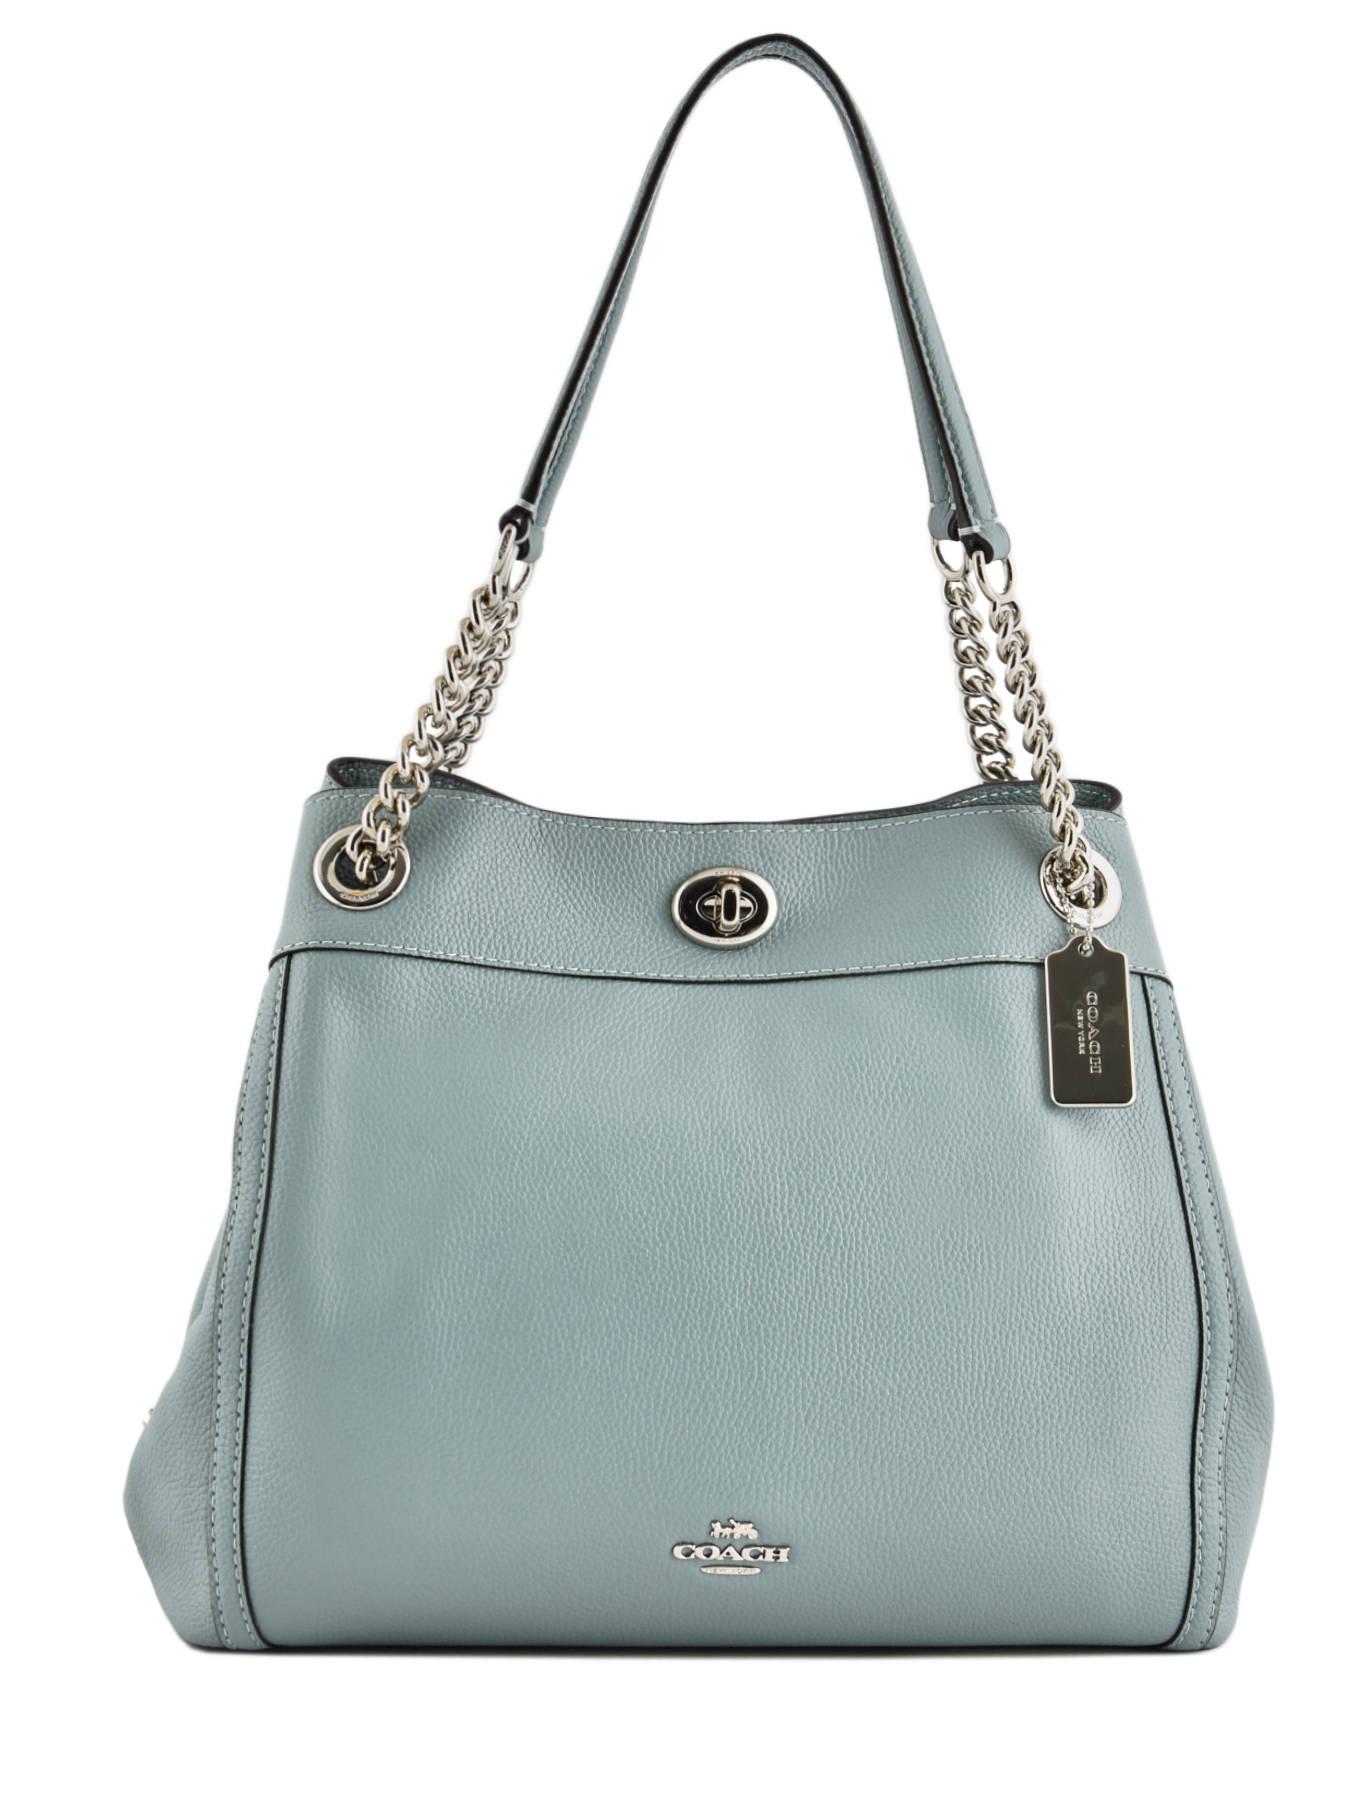 ... Shopper Edie Leather Coach Green edie 36855 ... 19d414febf5f5